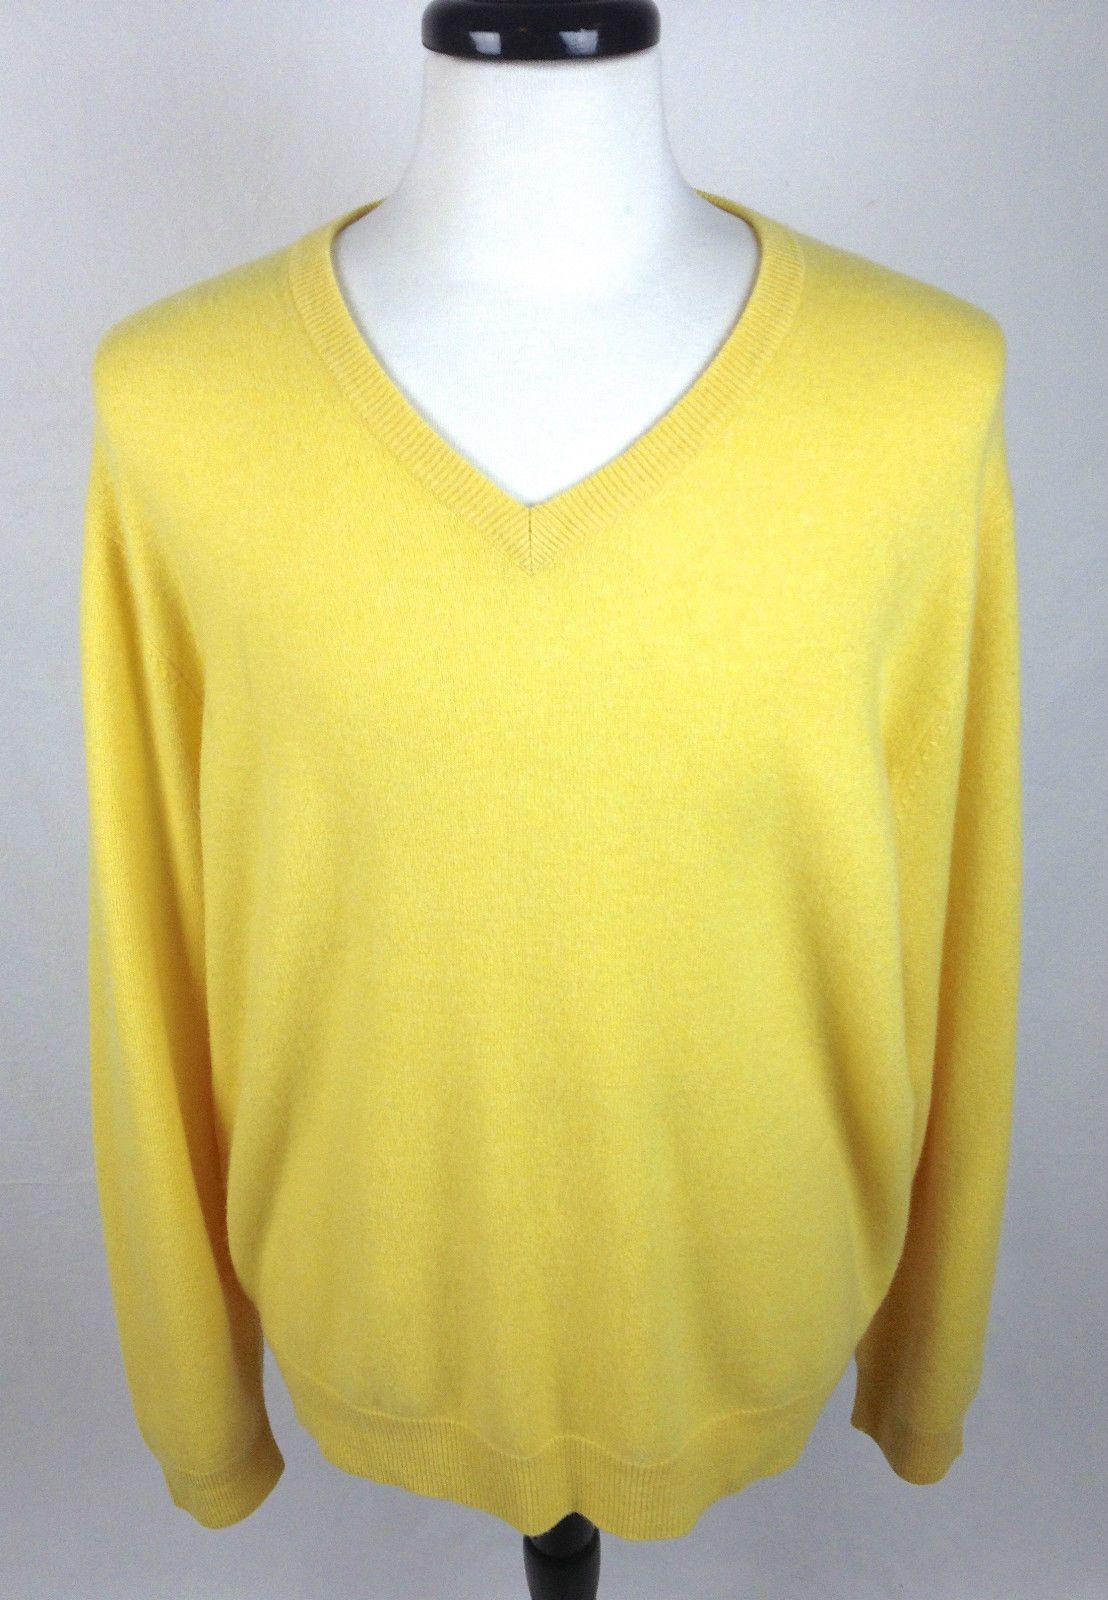 Sweater + Sweatshirt Sale for Women | Urban Outfitters